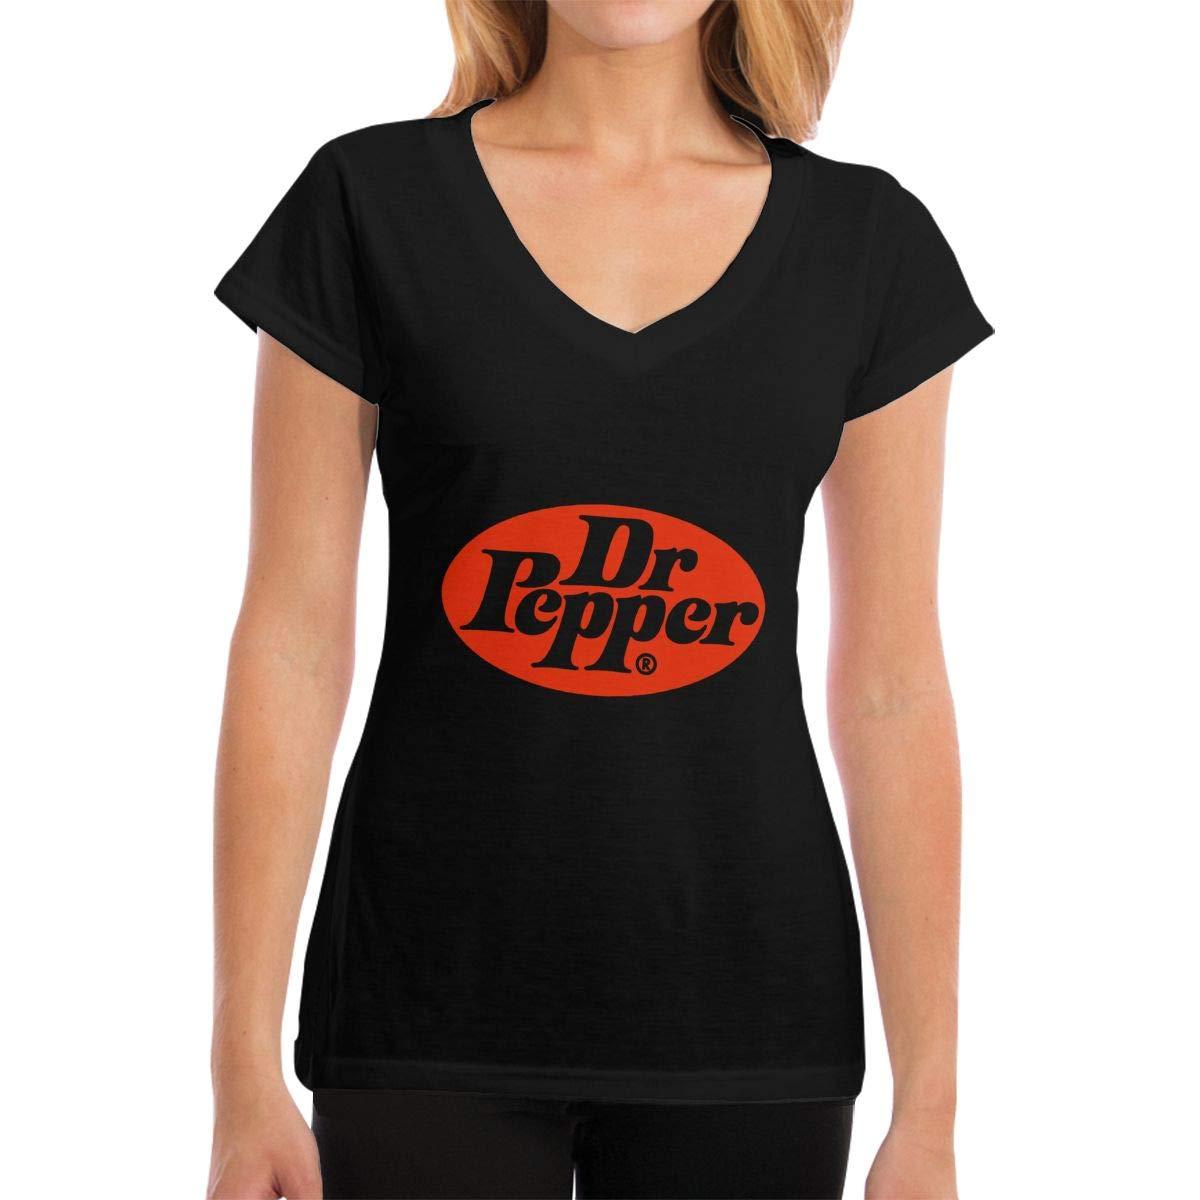 T-shirt For , Dr Pepper Short Tee Summer T-shirt For Work Sports